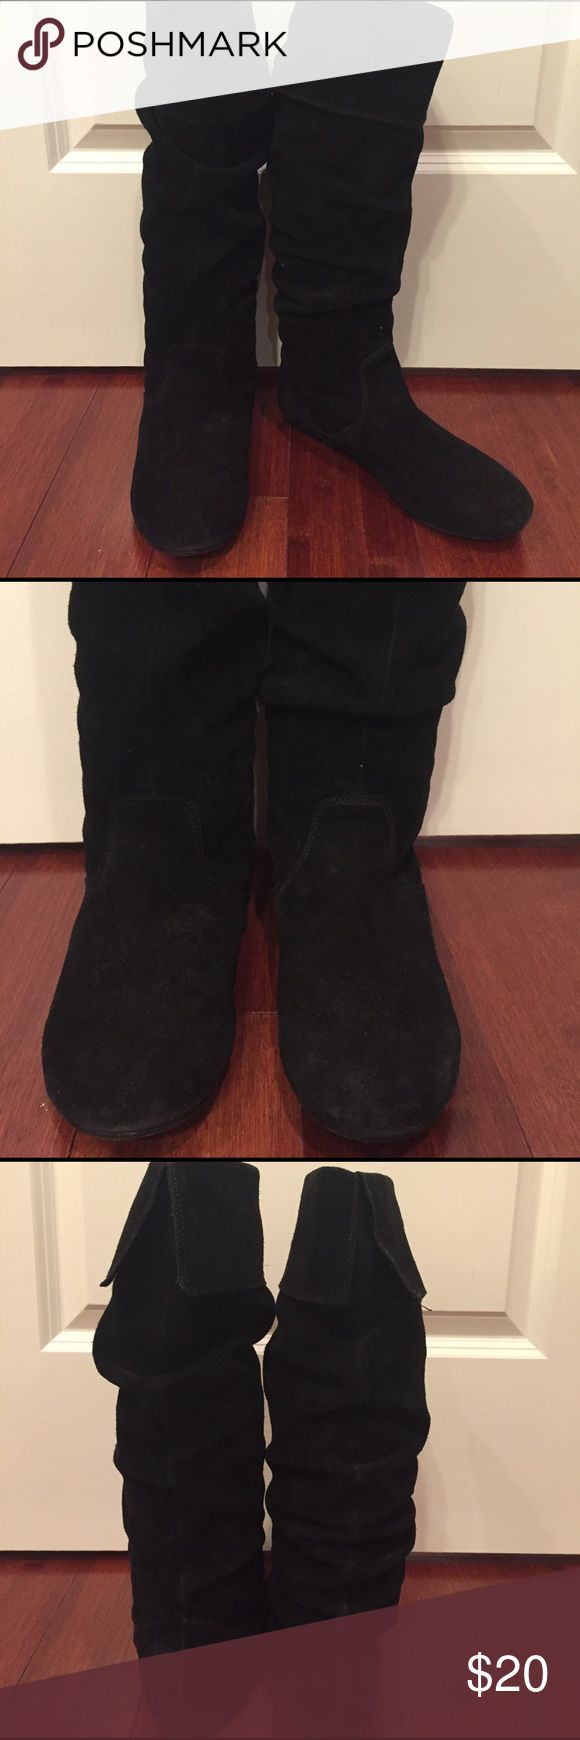 Steve Madden Black suede flat knee boots Steve Madden Black suede flat knee boots. GUC. Style Bonanza. Steve Madden Shoes Winter & Rain Boots